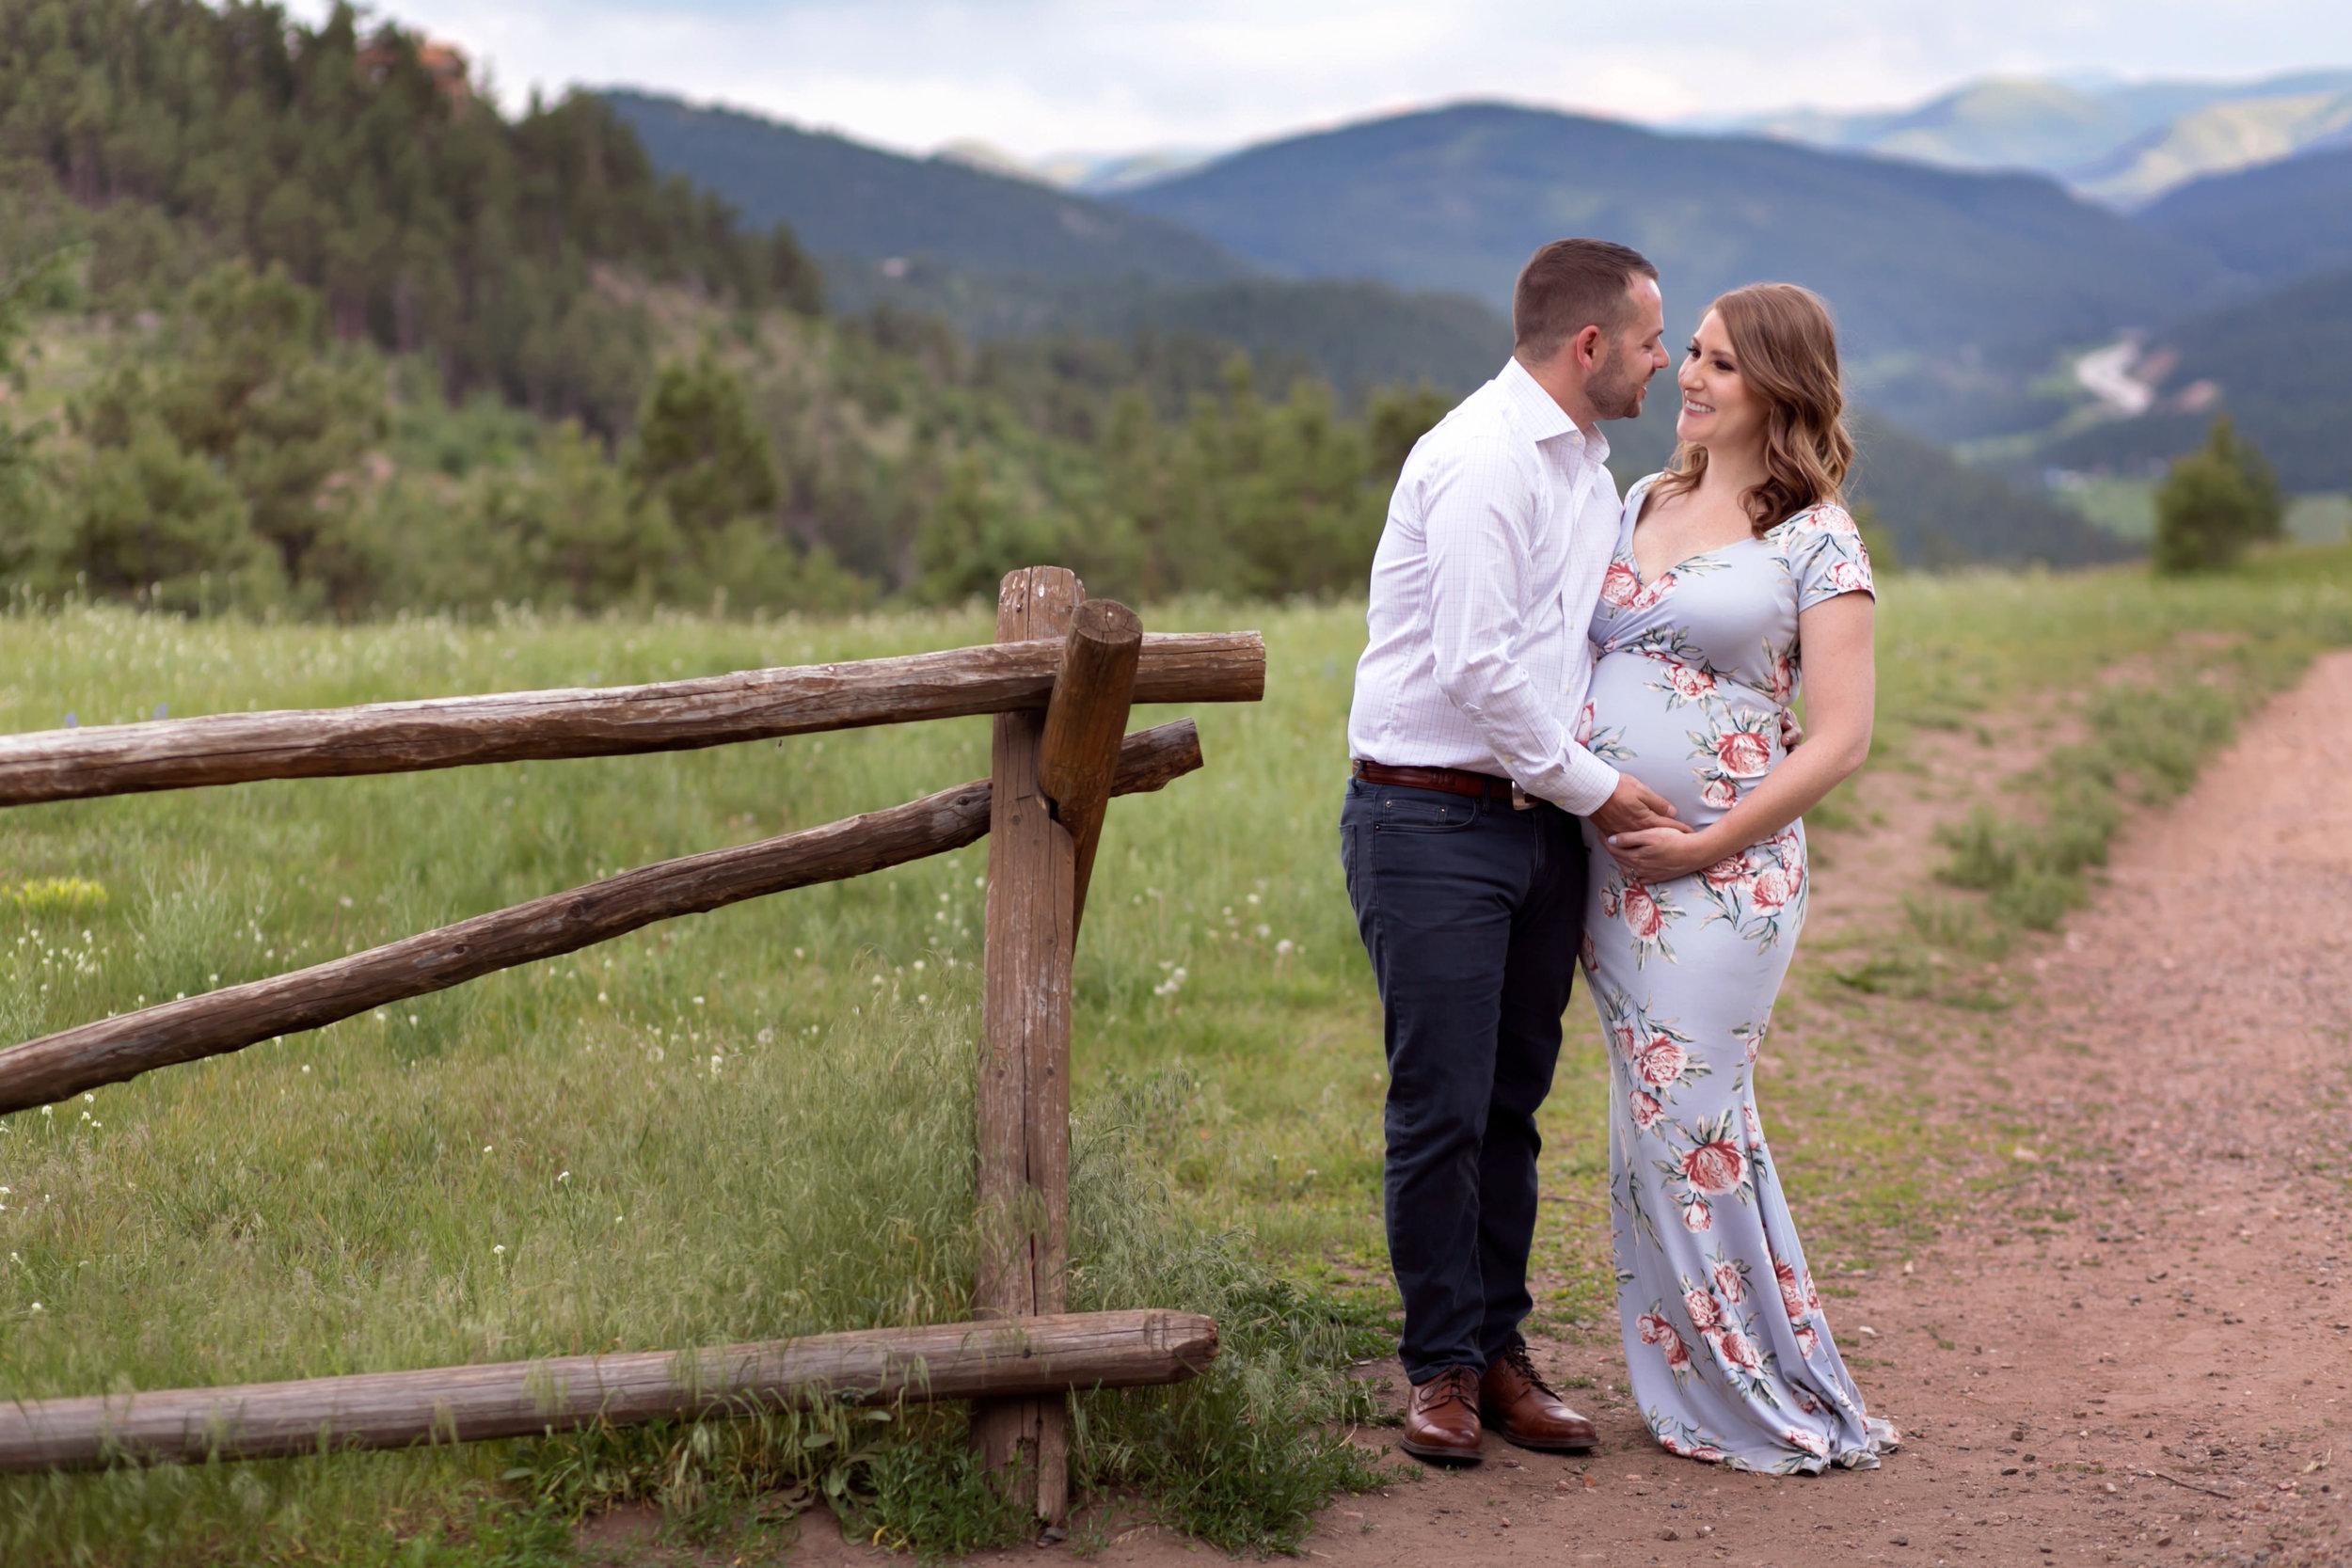 Denver Newborn Photographer Denver Maternity Photographer Denver Fitness Photographer bOulder Maternity Photographer Boulder Newborn Photographer